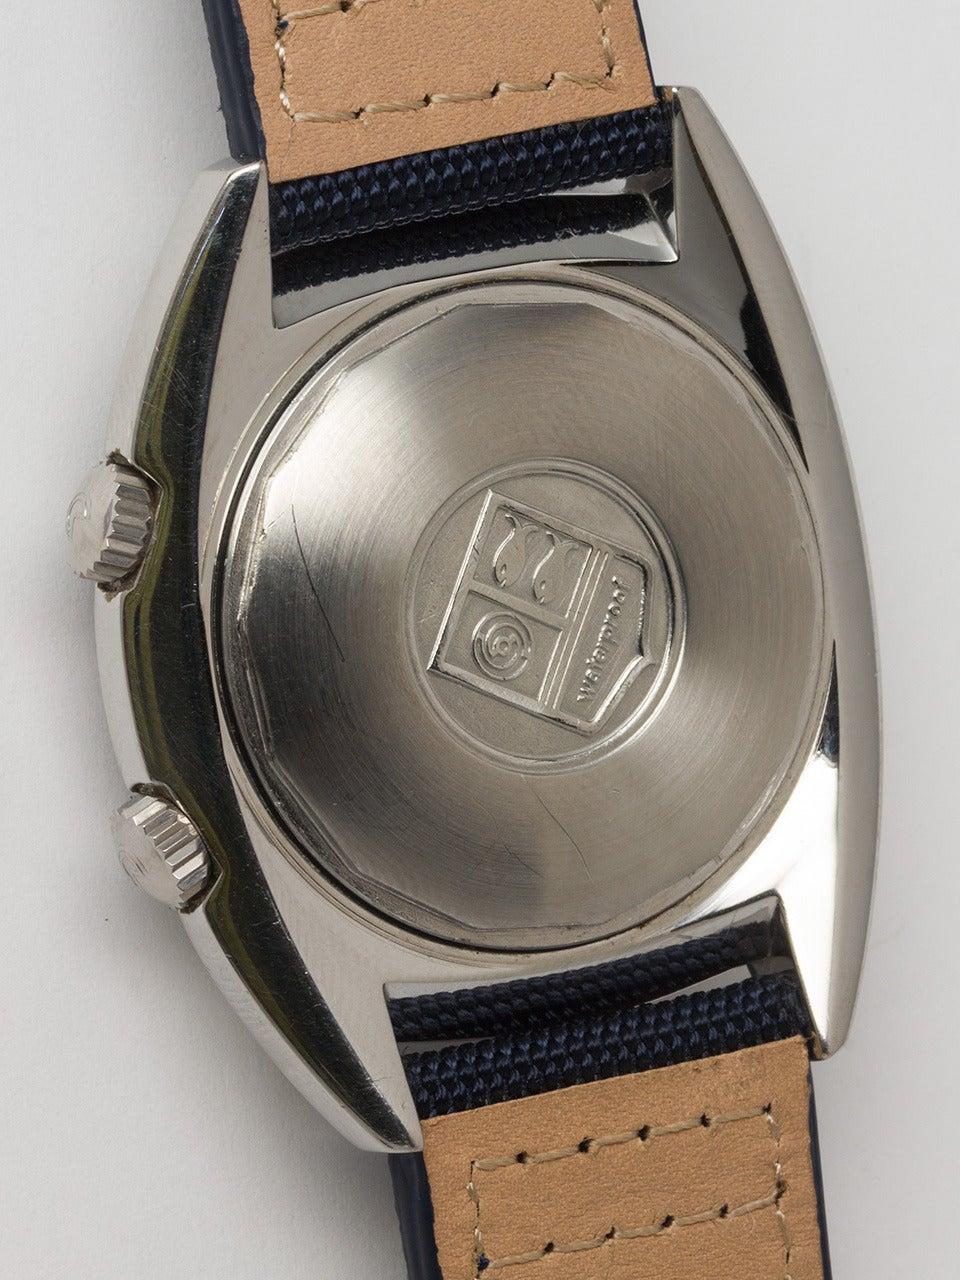 Wyler replica watches - Wyler Watches Ca